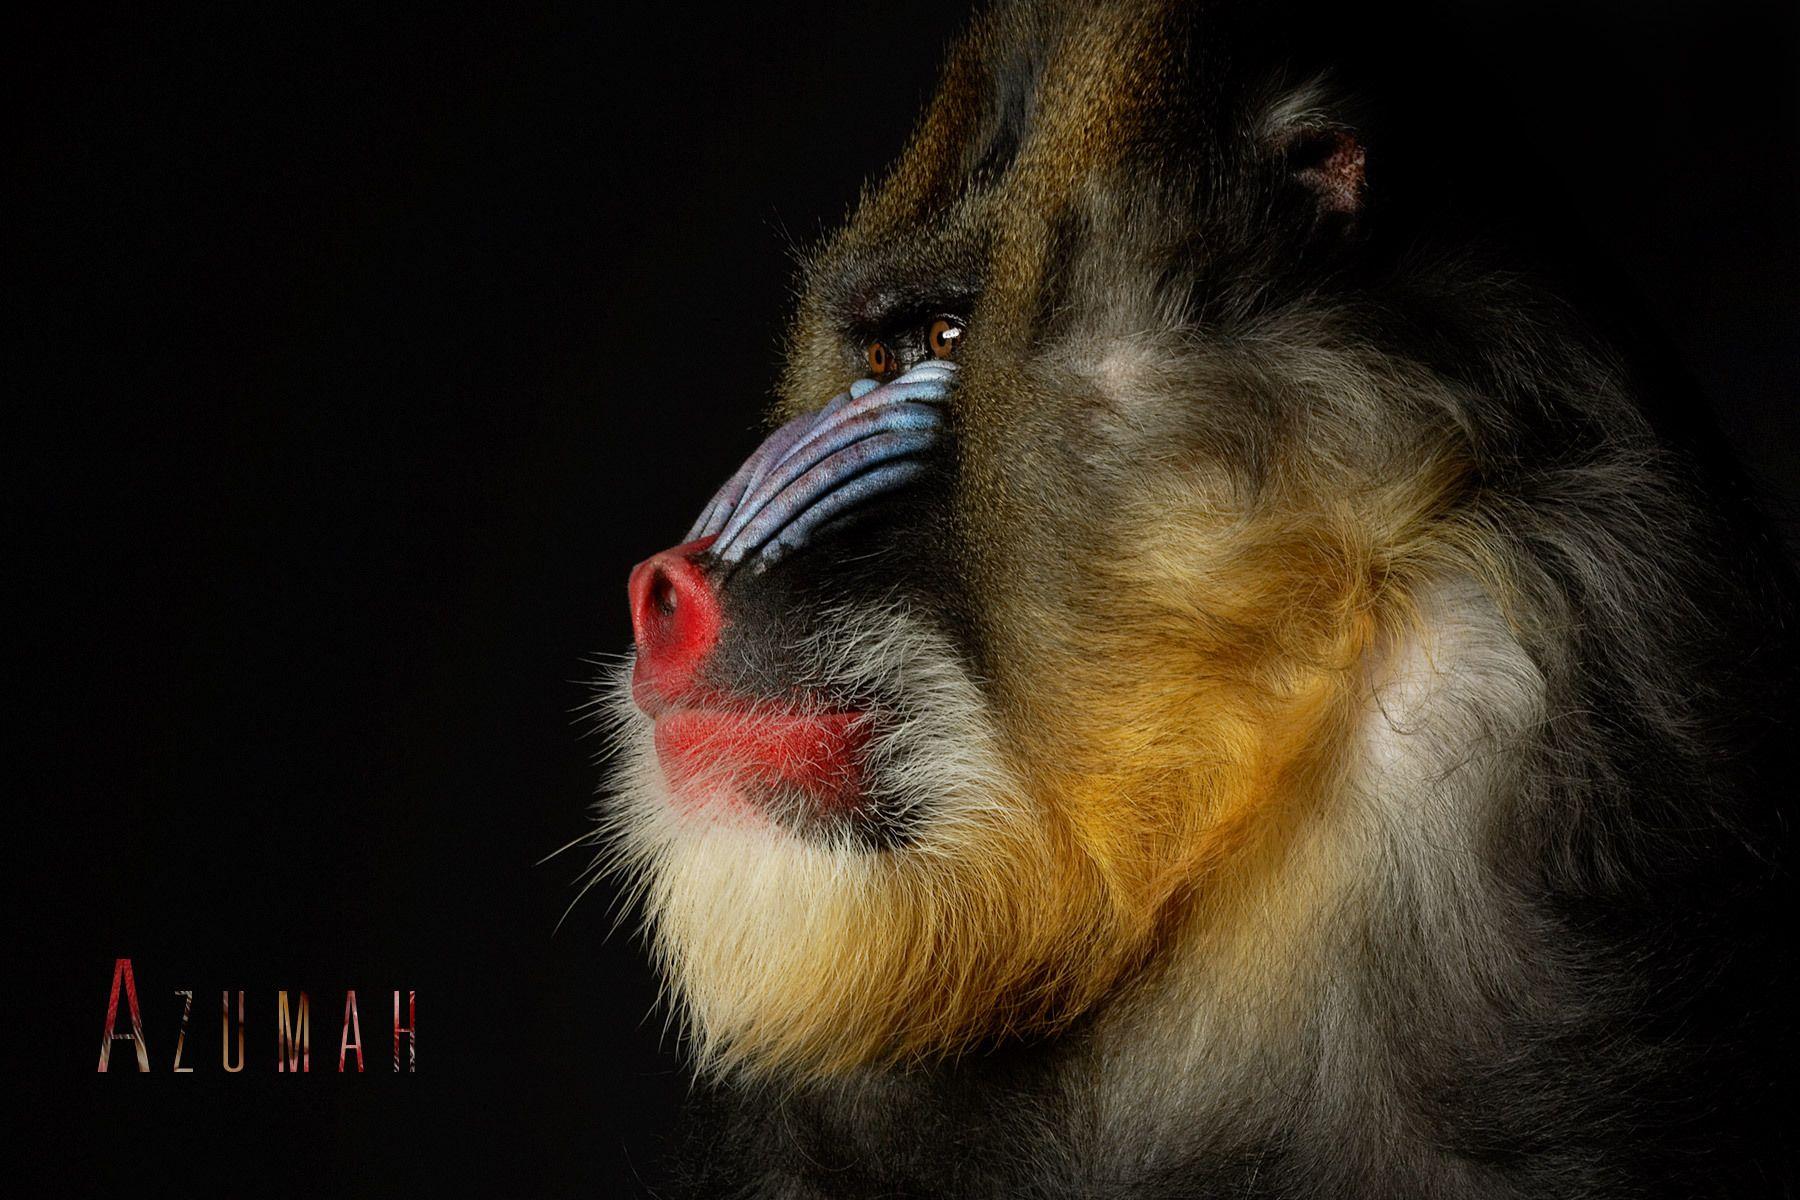 1beauty_mandrill_azumah_a.jpg